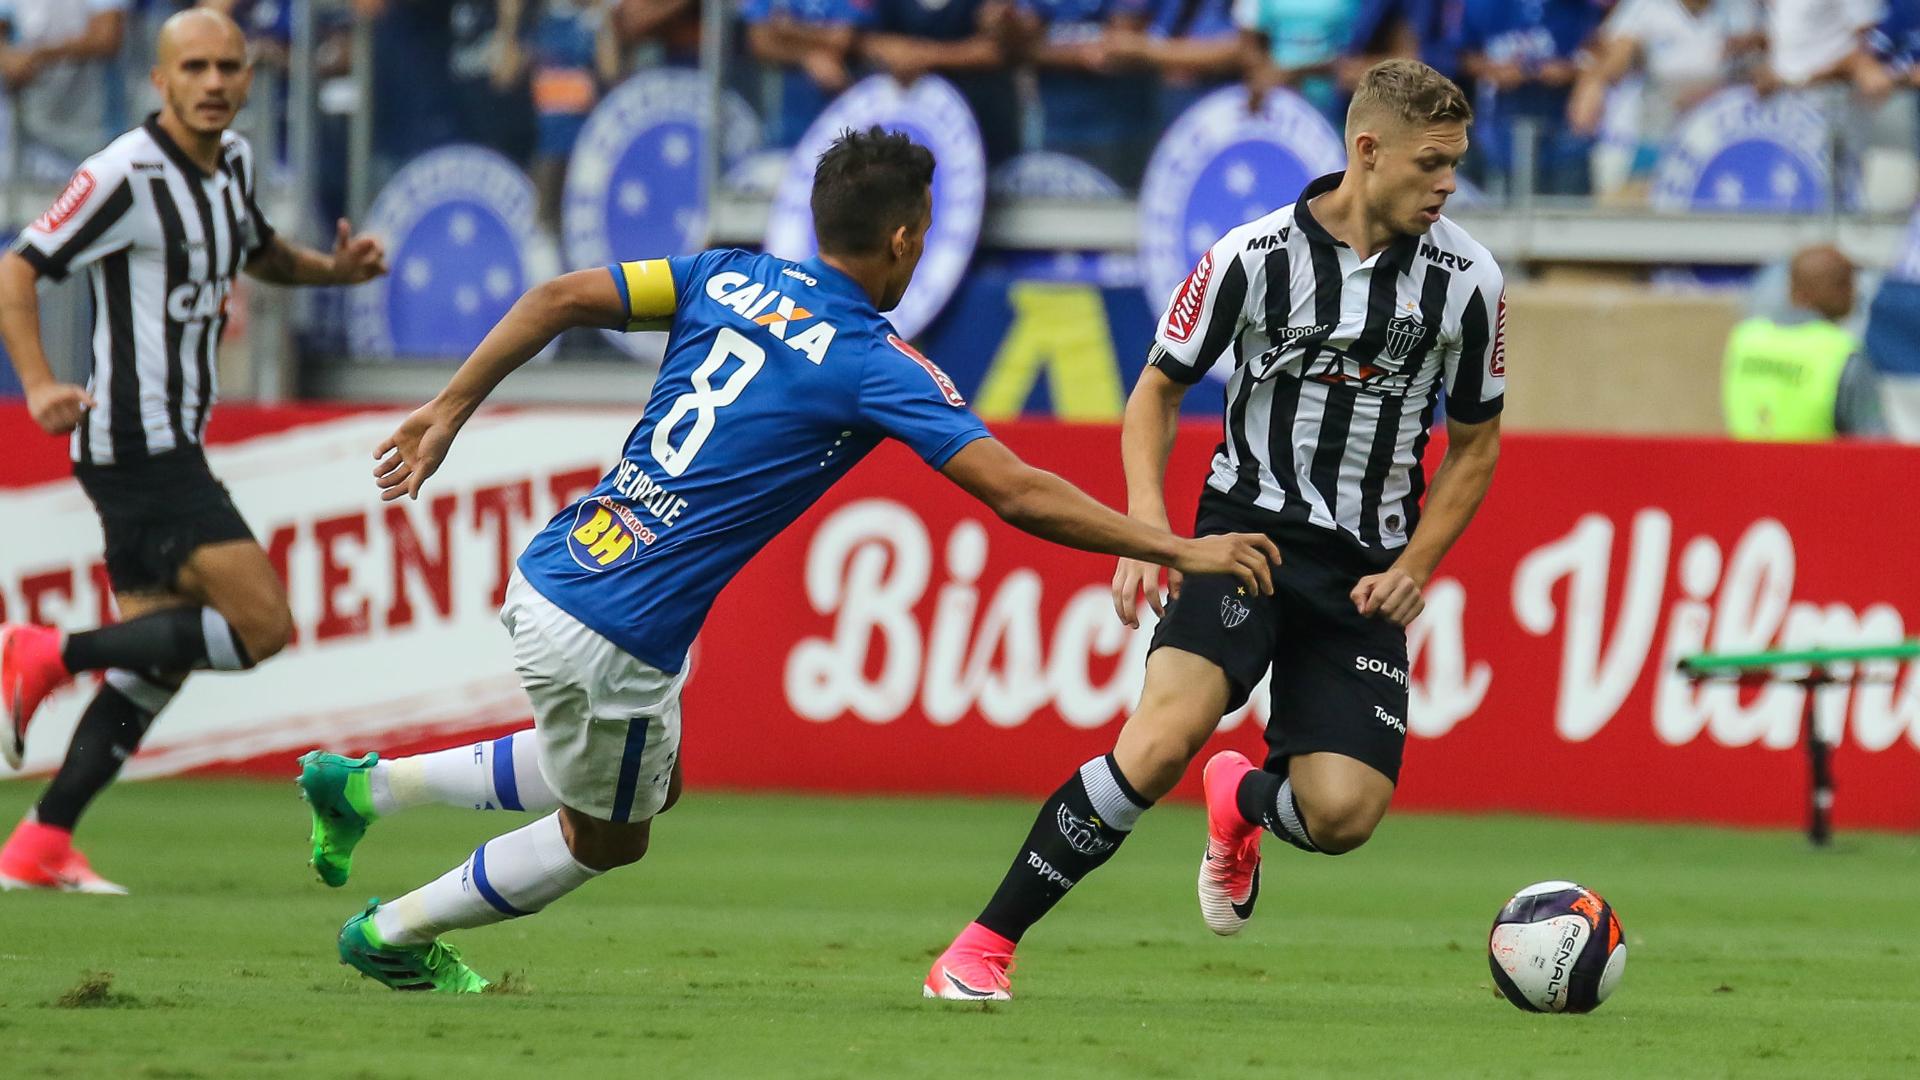 Marlone Henrique Cruzeiro Atlético-MG Campeonato Mineiro 30042017